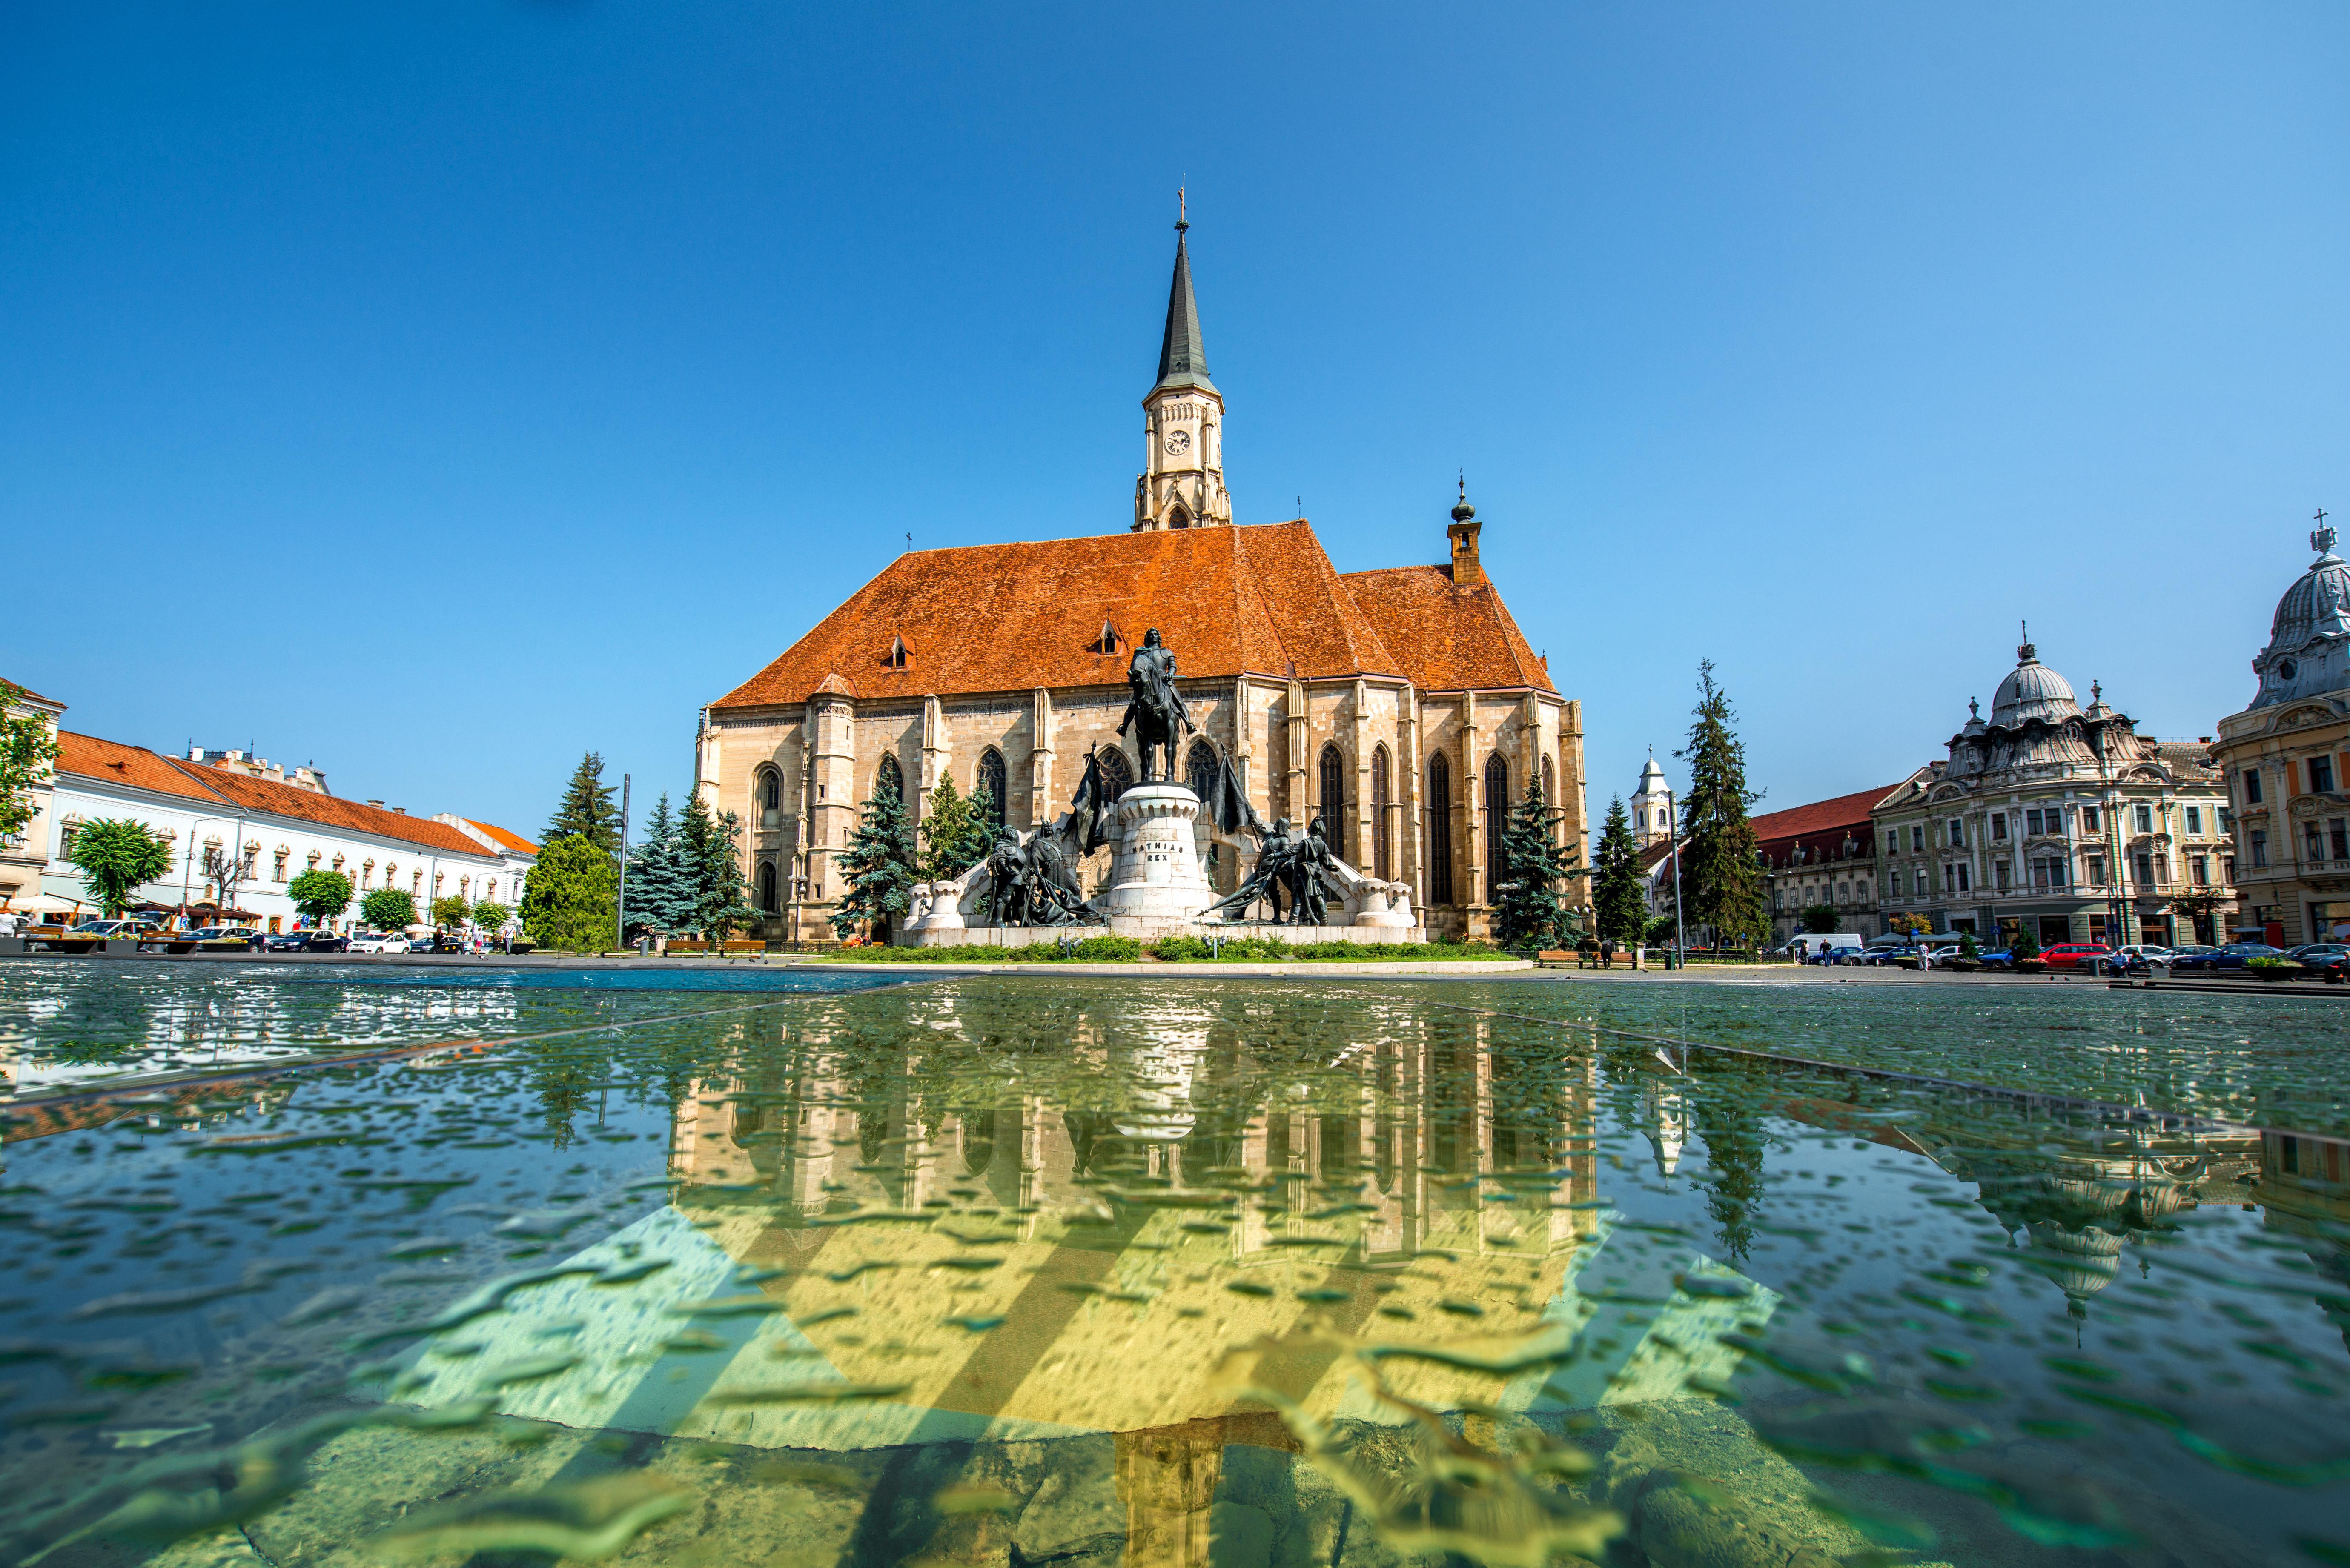 Michael's church and Matthias Corvinus monument in Cluj Napoca in Romania